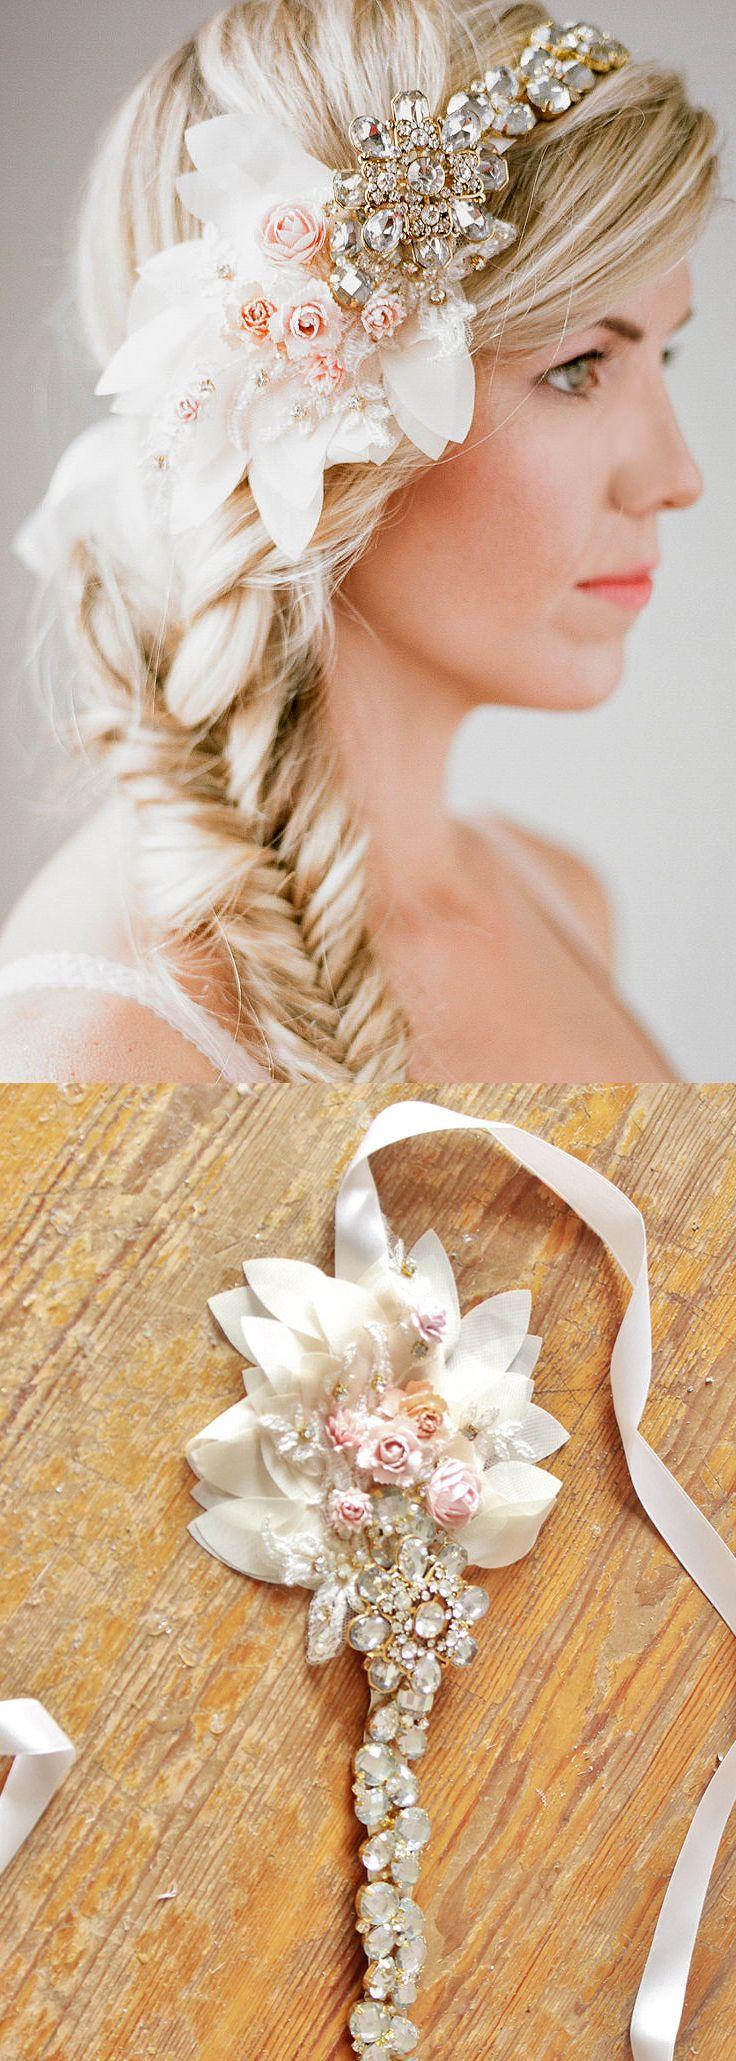 Floral Bridal Headpiece, Crystal Bridal Headband, Bridal Headpiece. This Bridal hairband is detailed with gold set rhinestones, rhinestones and tiny flowers in a romantic and whimsical asymmetrical pattern. Weddings Flowers Floral Headband Hairvine. Bride or Bridesmaids. #springwedding #winterwedding #bridemaids #bride #bridalhair #fashion #affiliatelink #bridalwear #weddinghair #roaring20s #fairytalewedding #whimsicalwedding